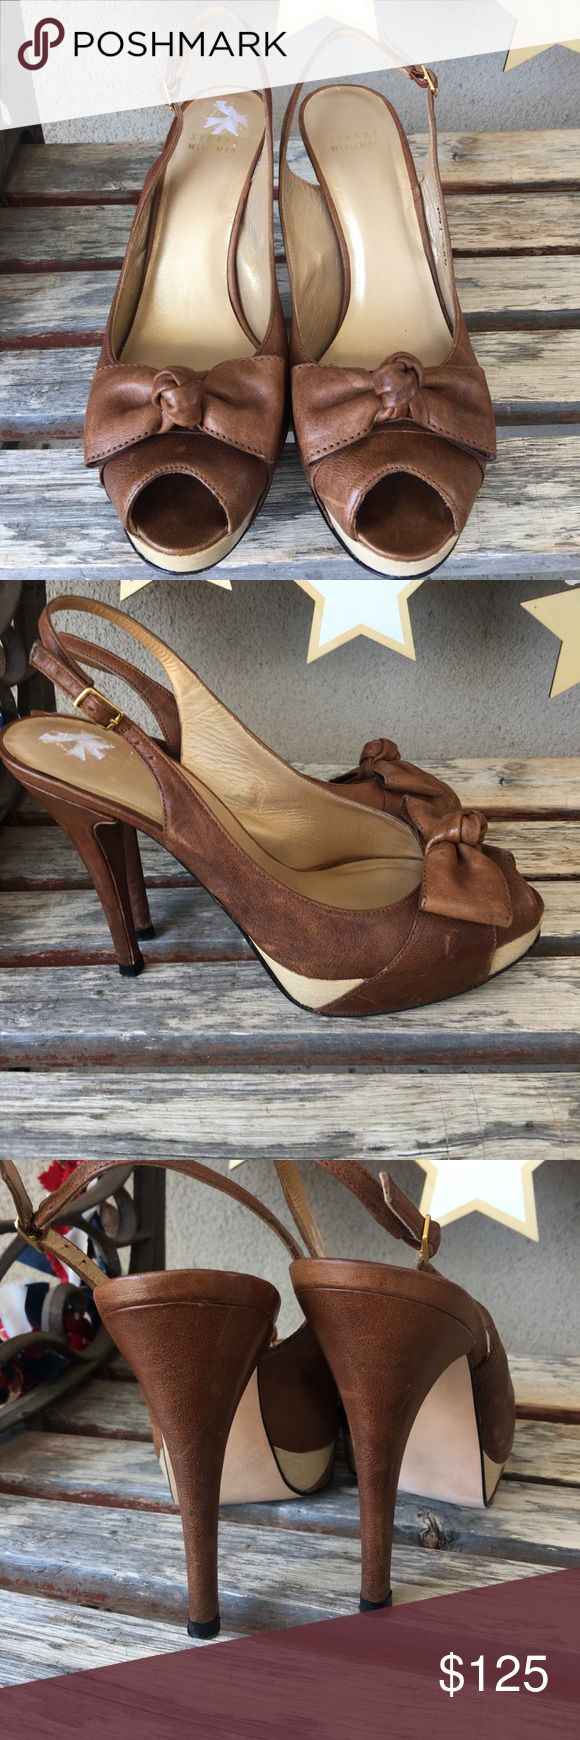 Stuart Weitzman brown bow heels size 8 Stuart Weitzman brown distressed leather bow heels size 8. Some scuffs on leather.  Leather soles. No box Stuart Weitzman Shoes Heels